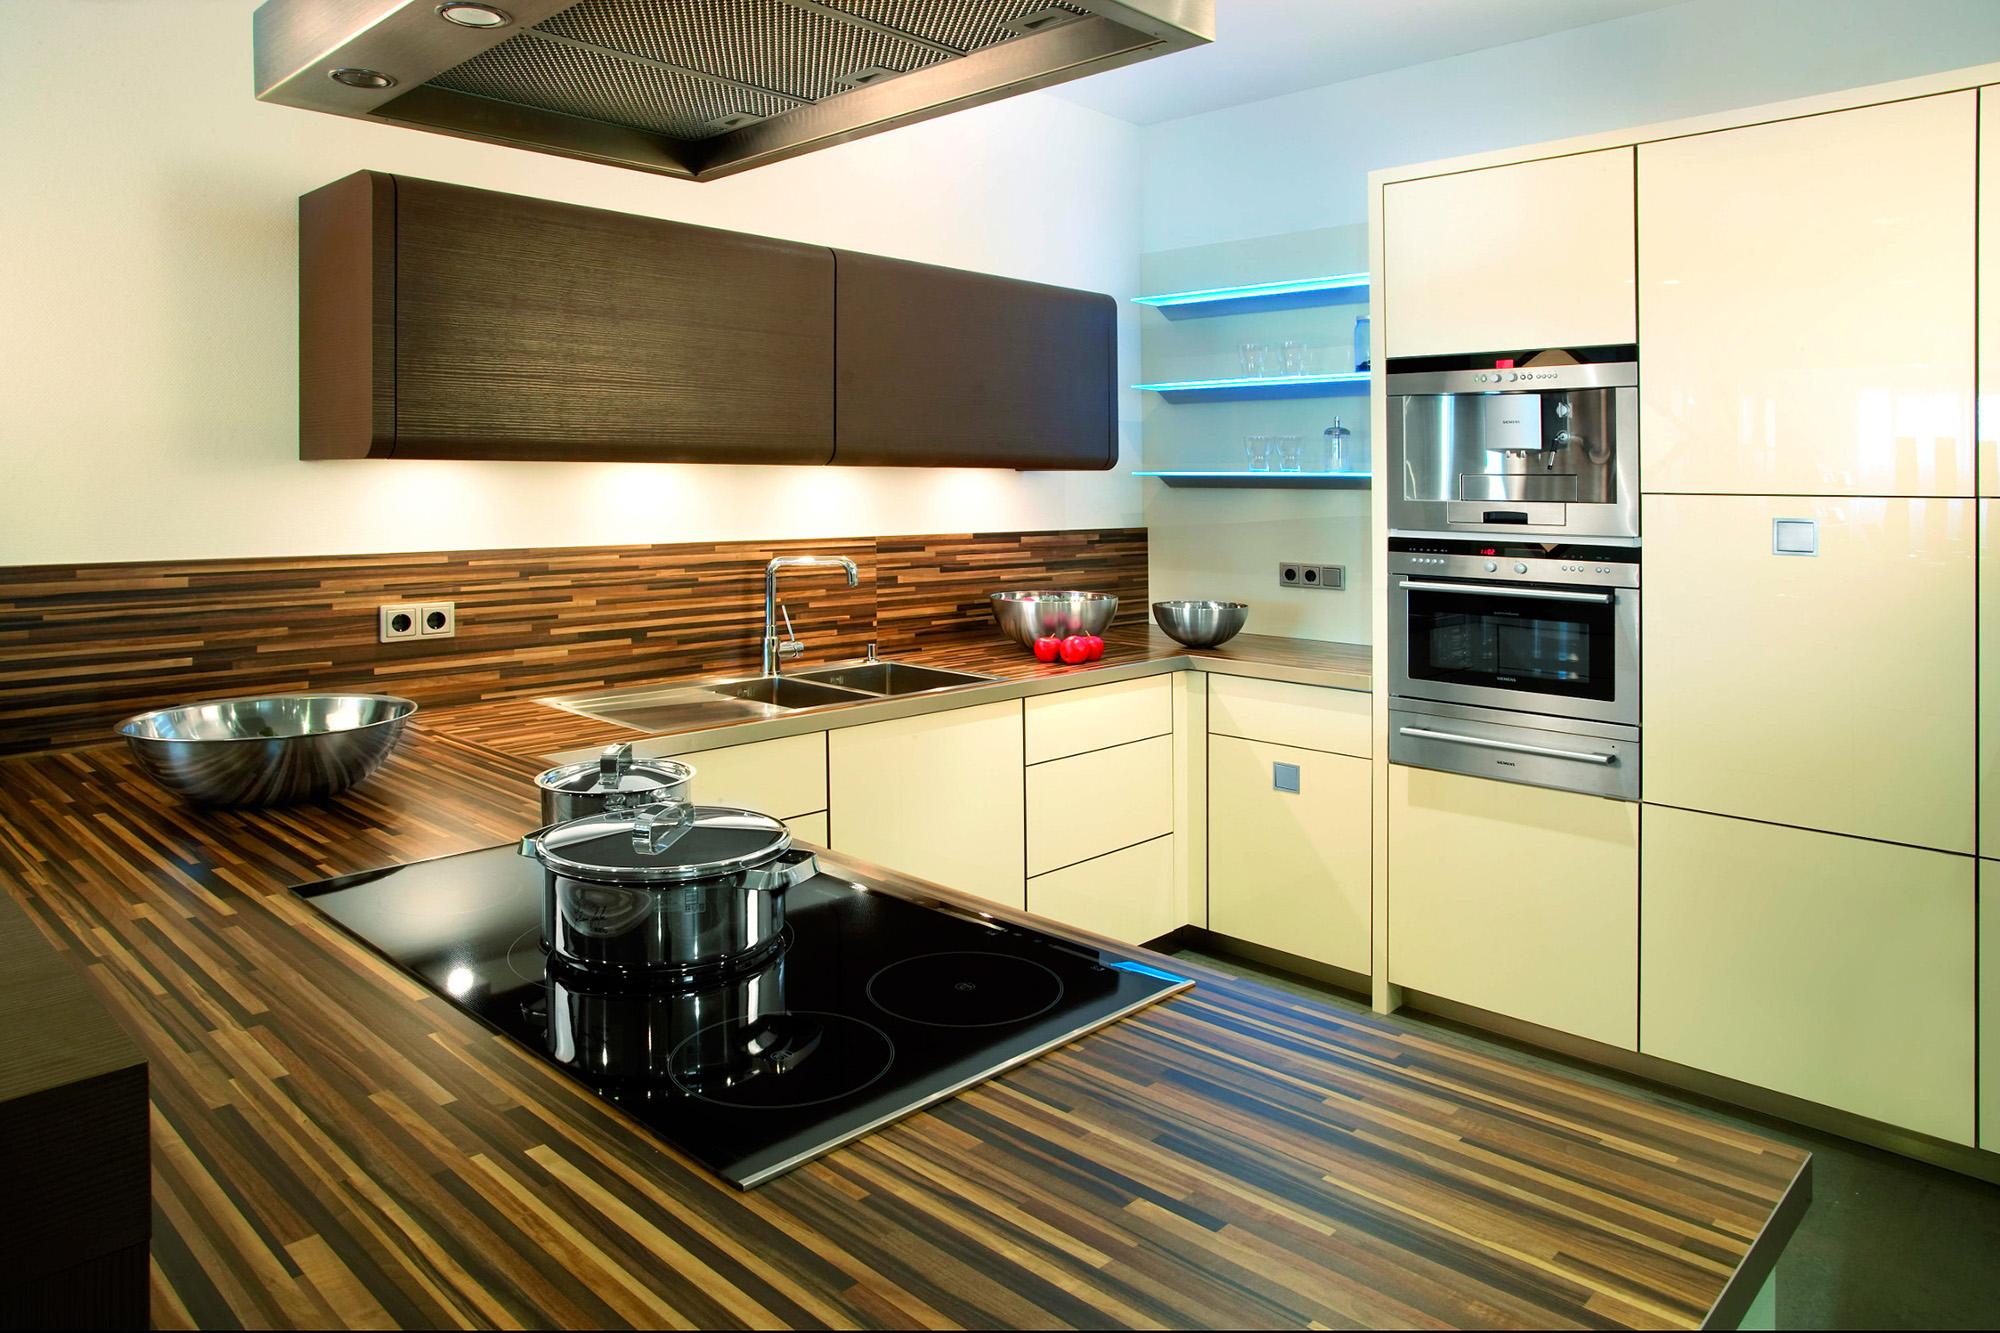 Коричнево-бежевая кухня в стиле минимализм